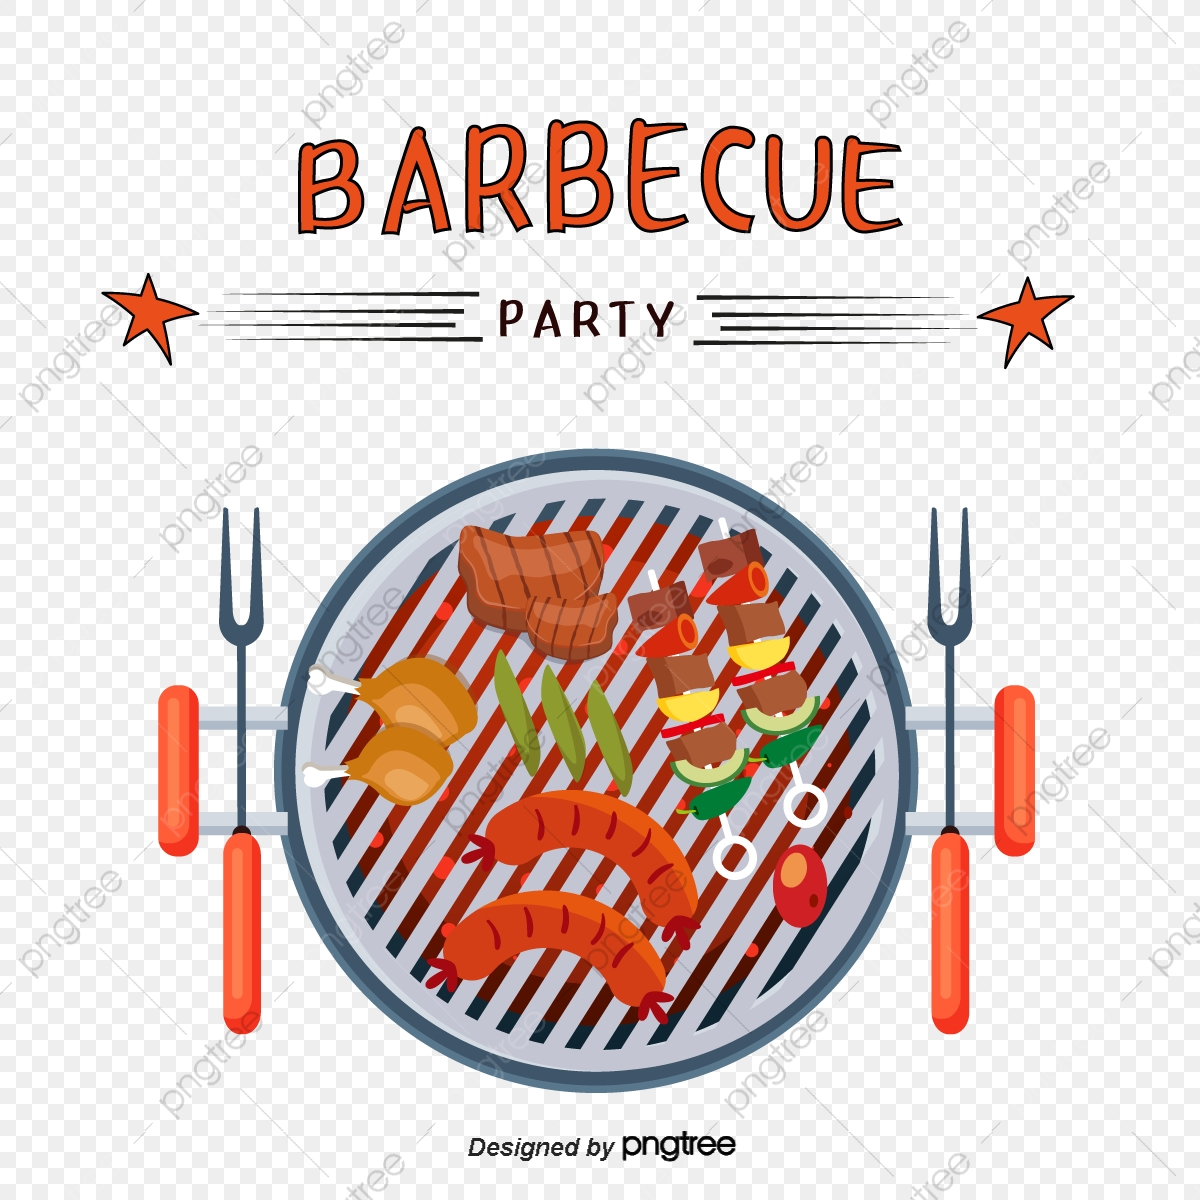 Download Barbecue Clipart Bbq Cook - Sausage Grilling Utensils Vector Png,  Transparent Png - kindpng